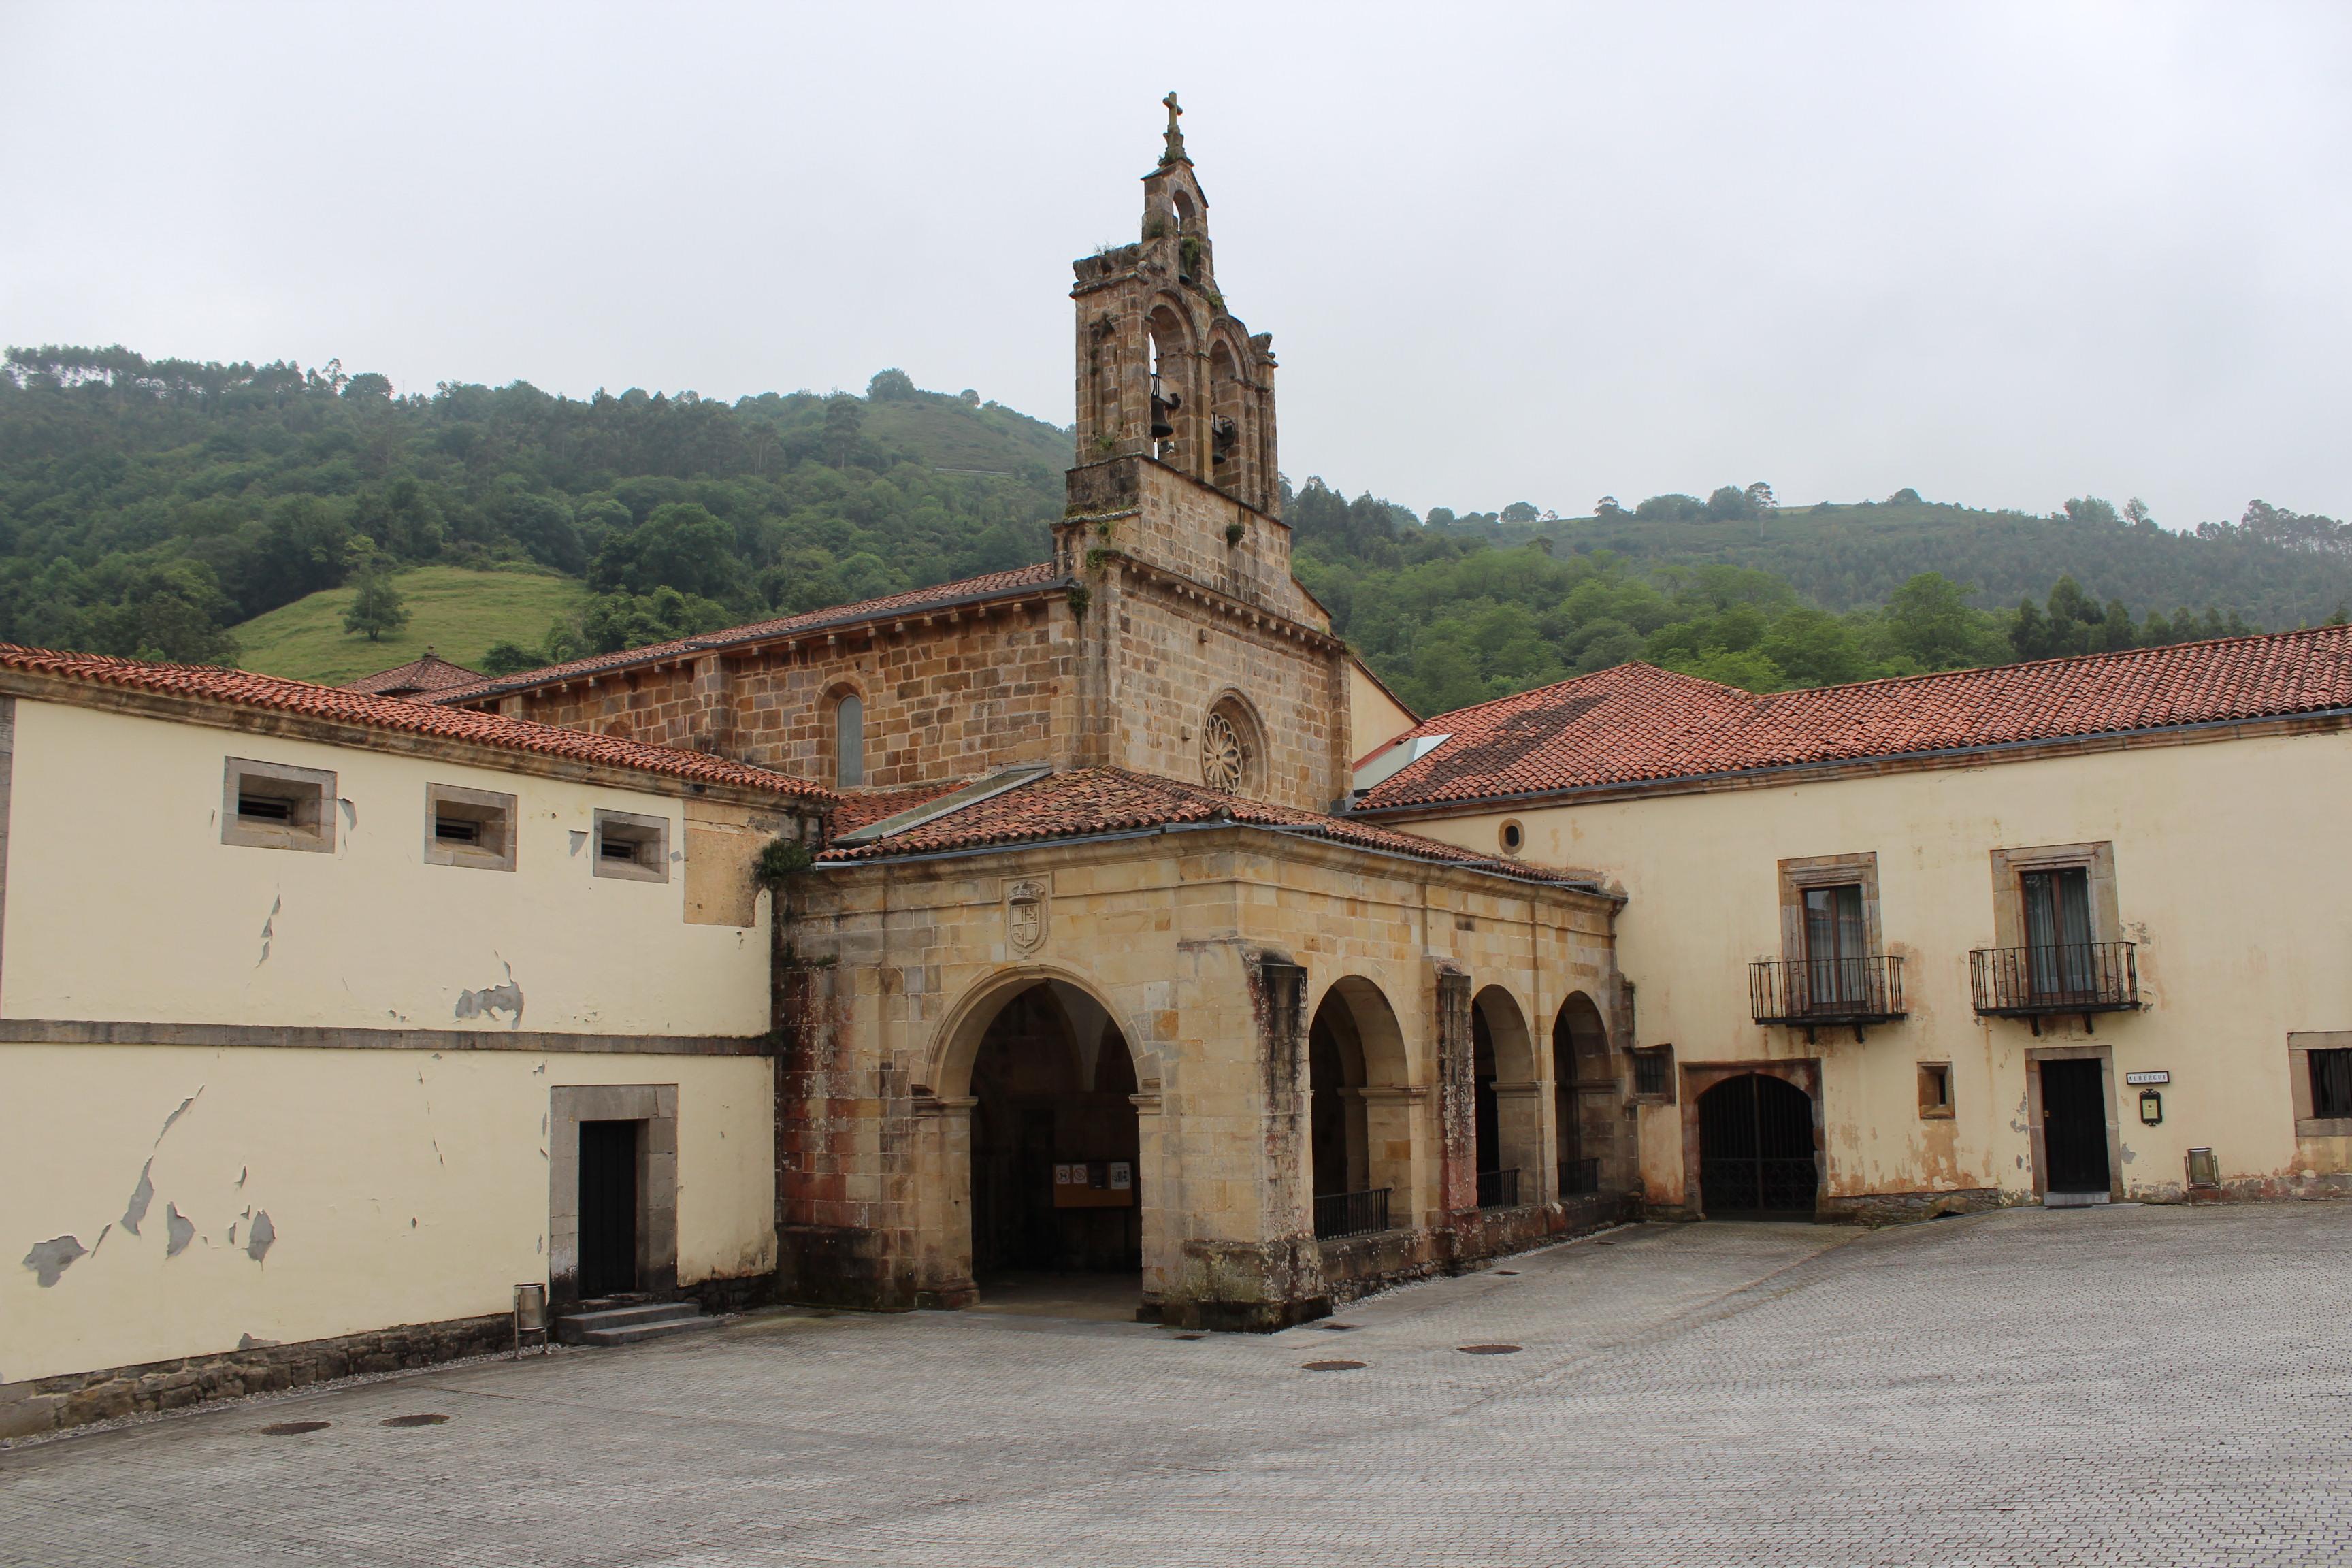 Valdedi s arzobispado oviedo for 11 marine terrace santa monica